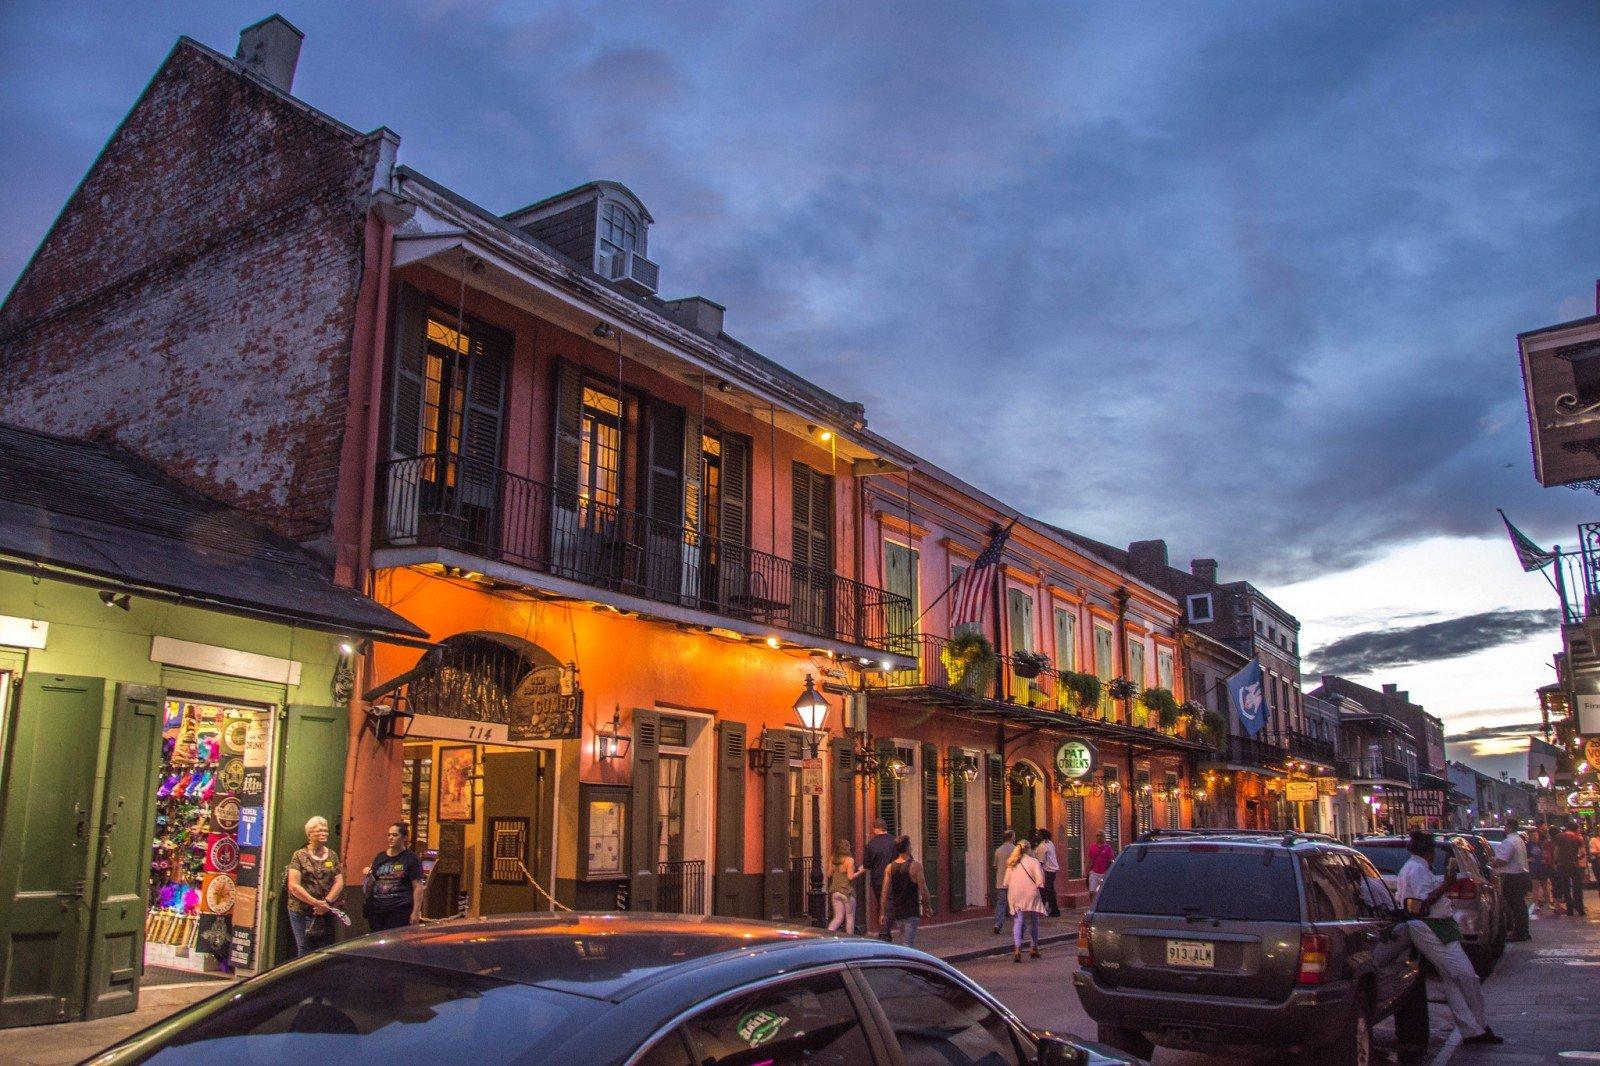 New Orleans' Tourism Goals Threaten Entertainers